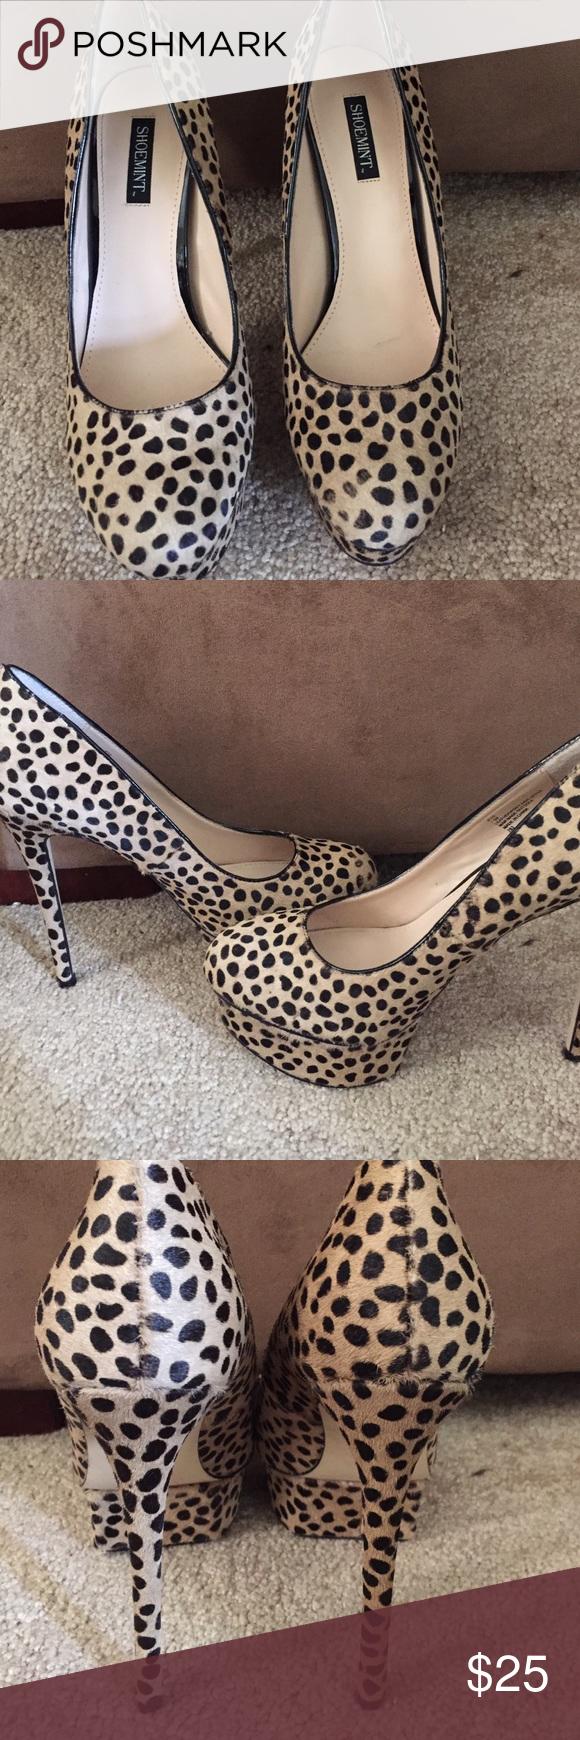 Leopard print heels Shoemint pony hair high heels. Heel height is 5inchs platform is 11/2inchs. Like new condition. Shoemint Shoes Heels